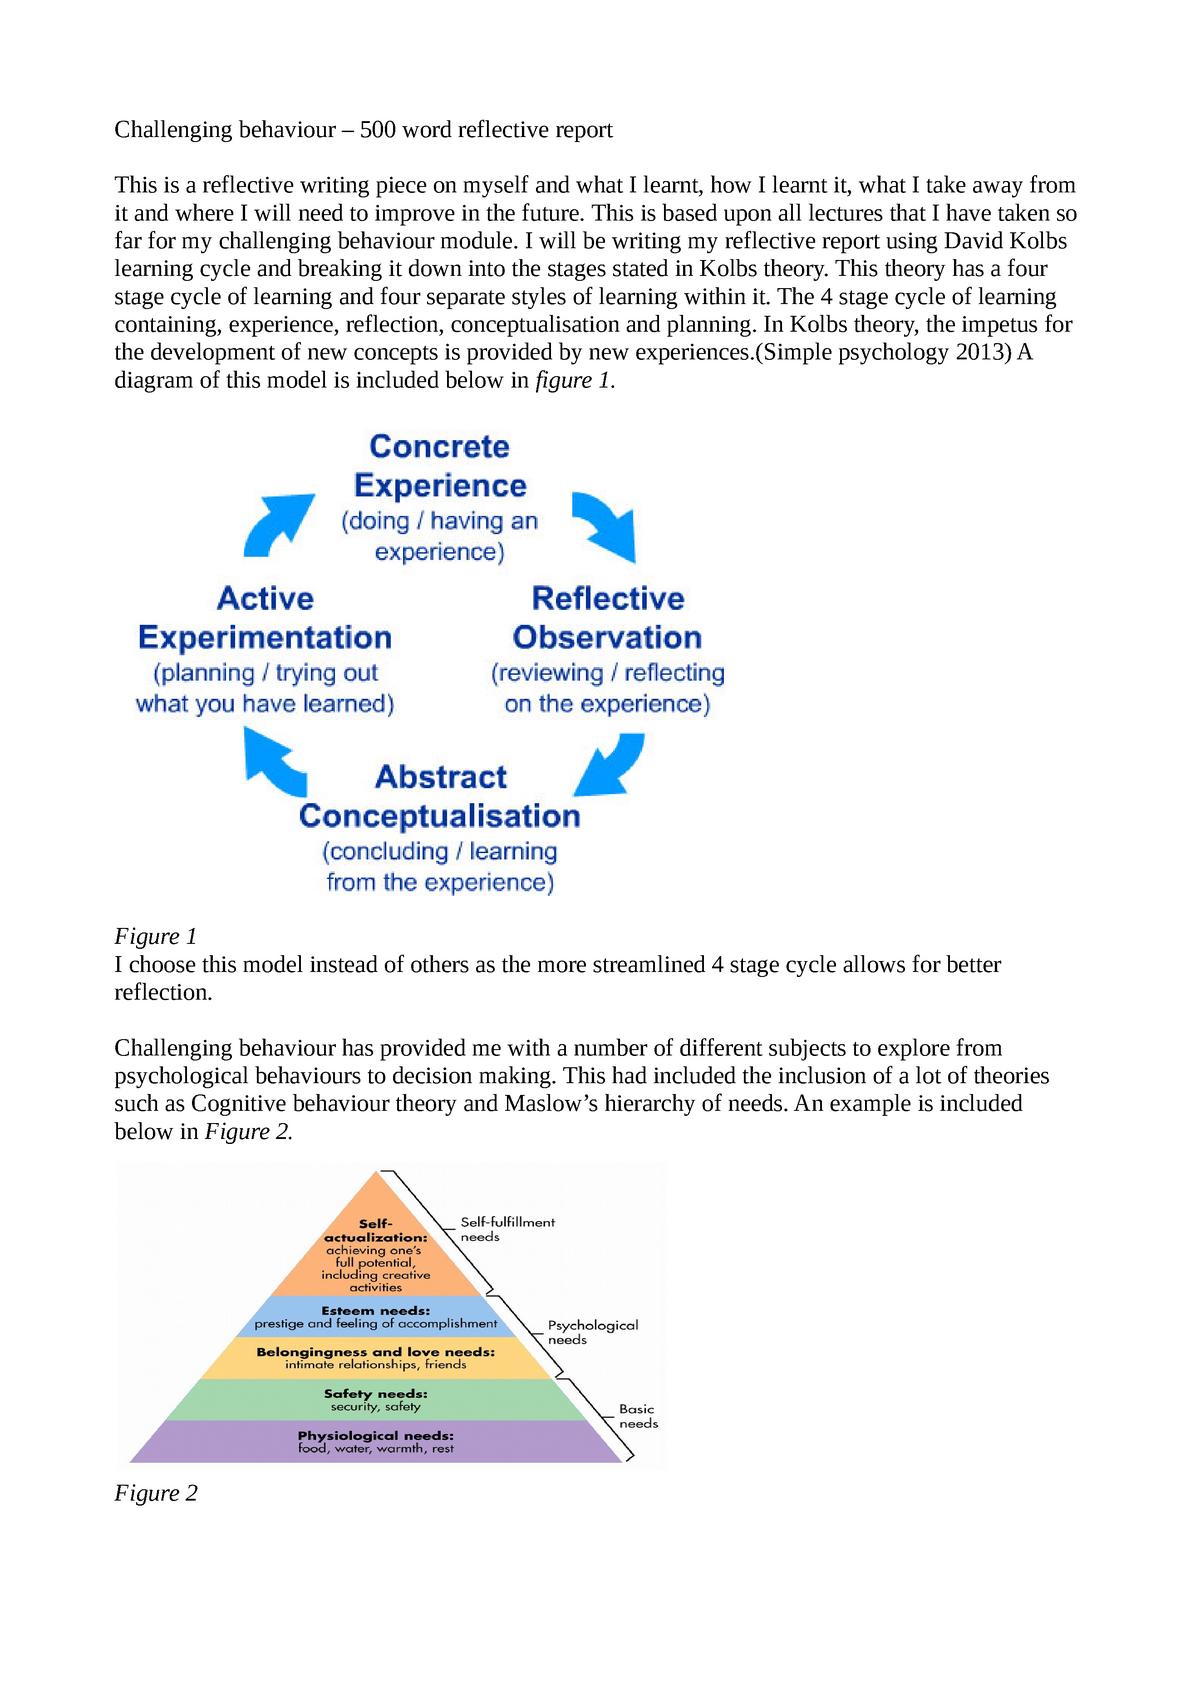 Reflective report 1 - CJS3001: Dealing With Challenging Behaviour